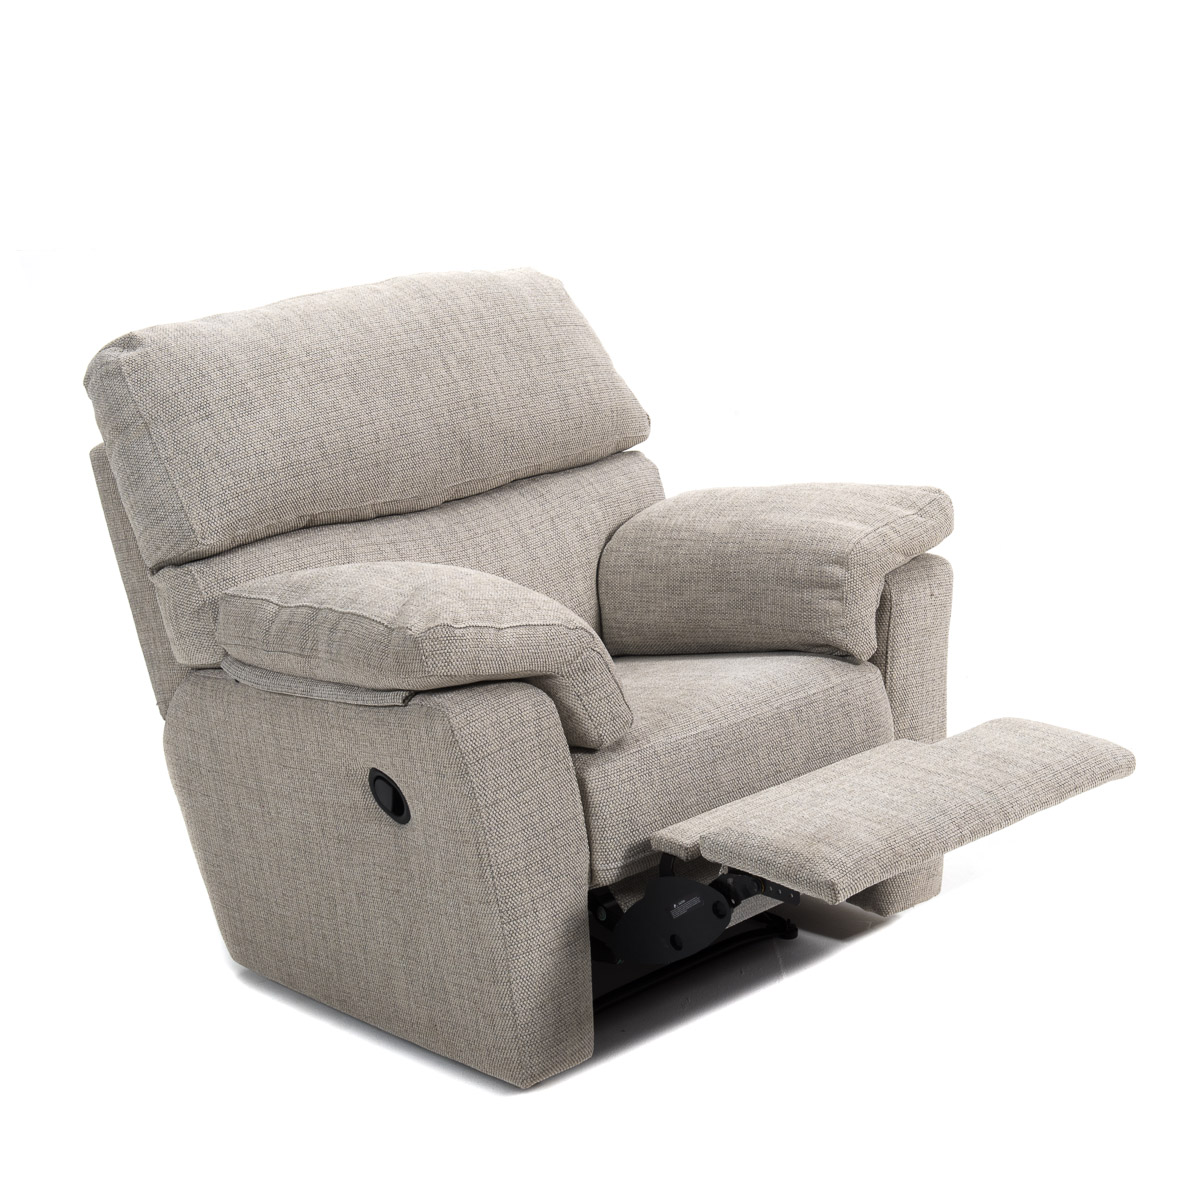 Miranda Manual Recliner Chair